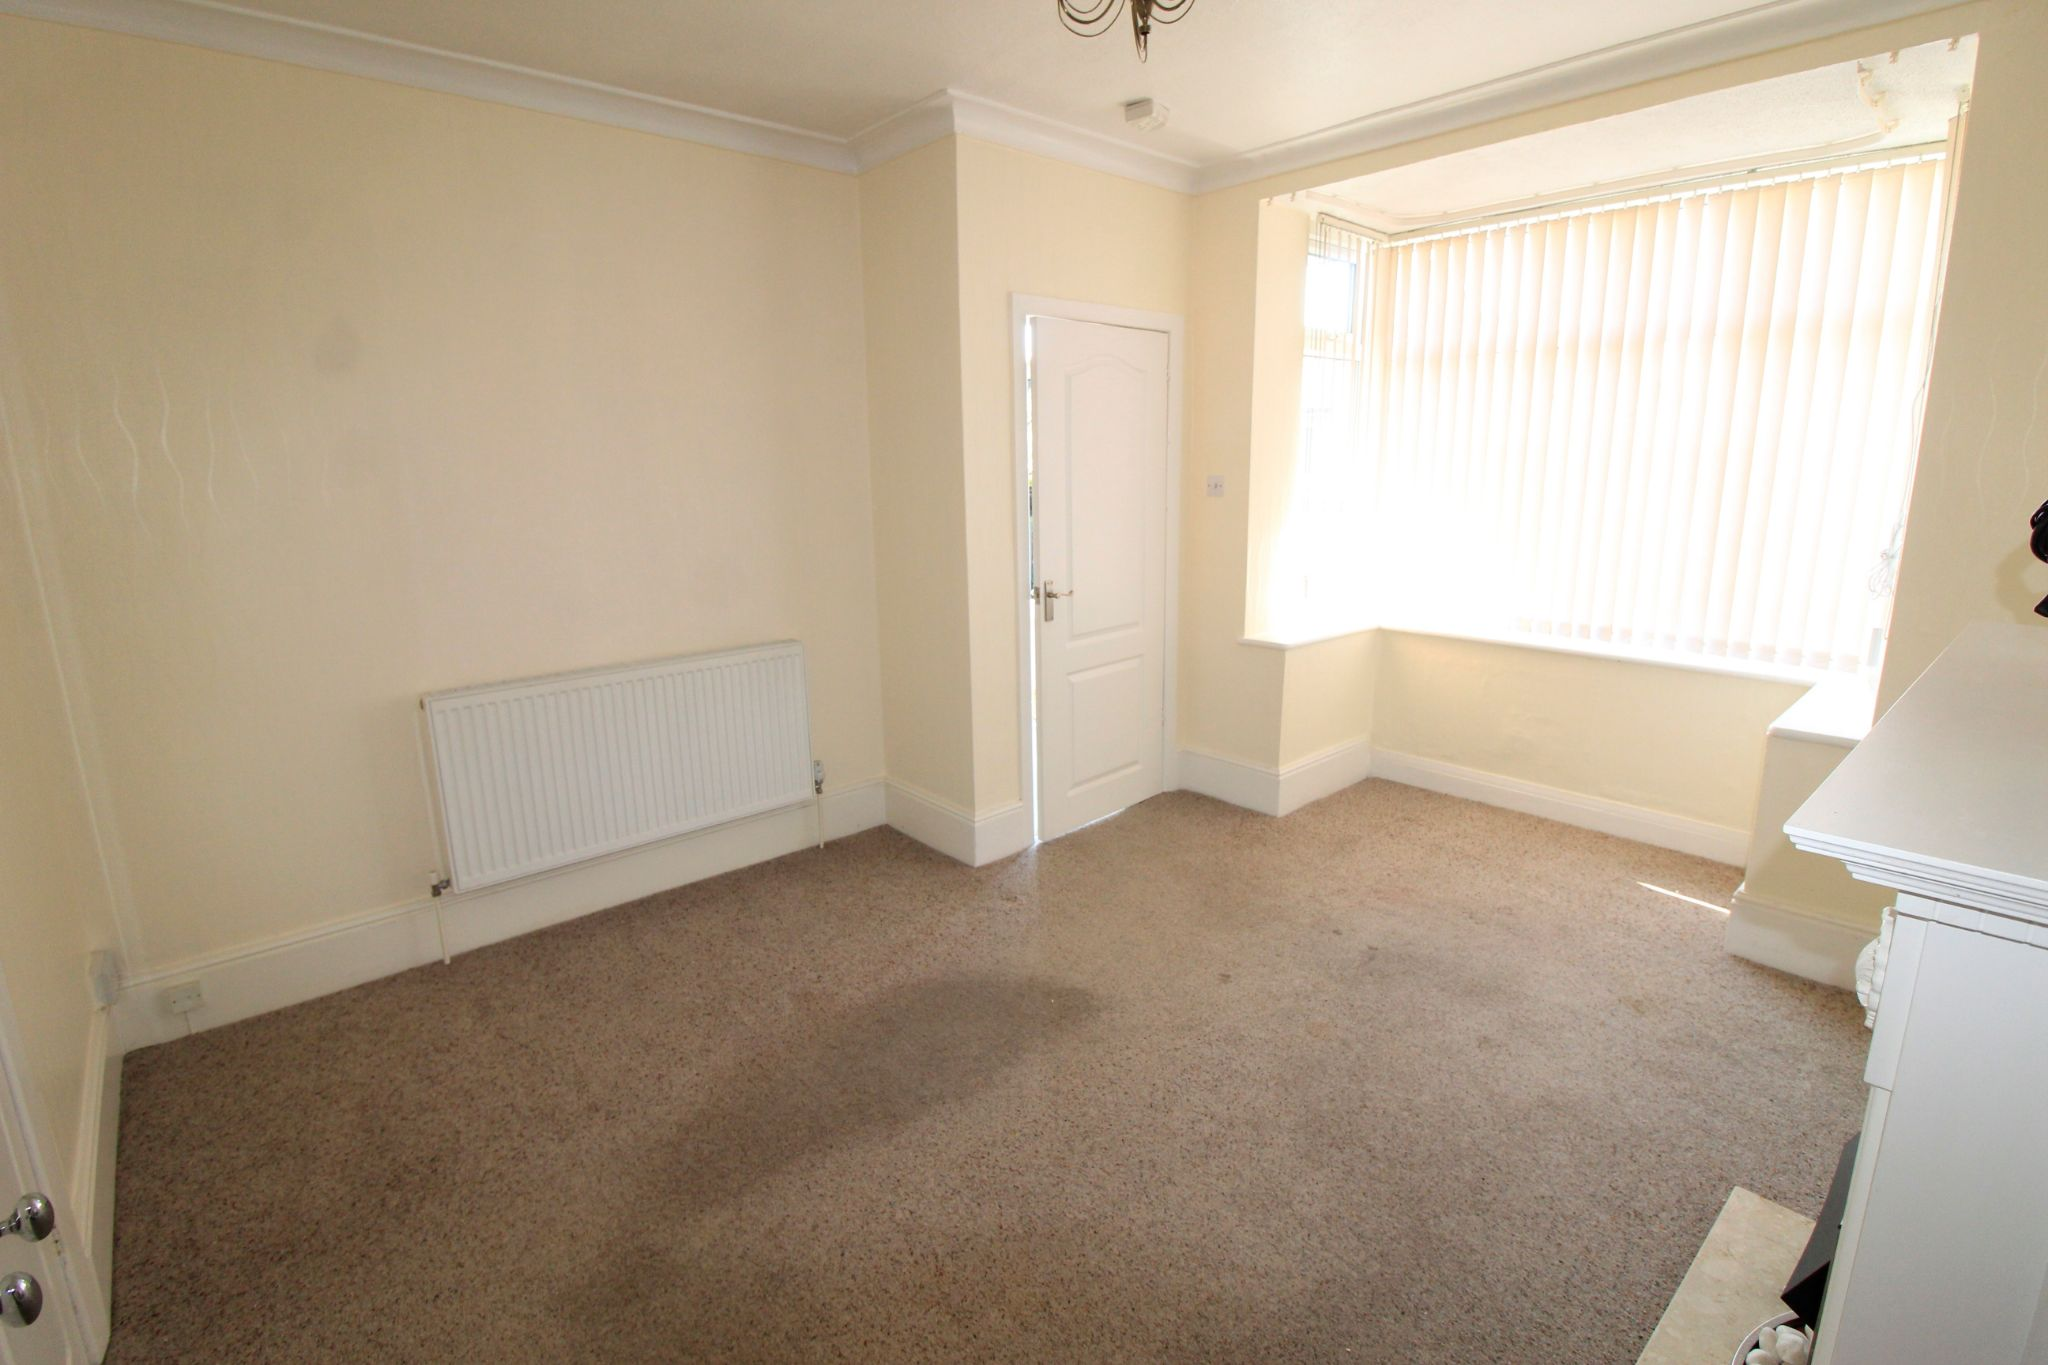 2 bedroom semi-detached house Let in Bradford - Lounge